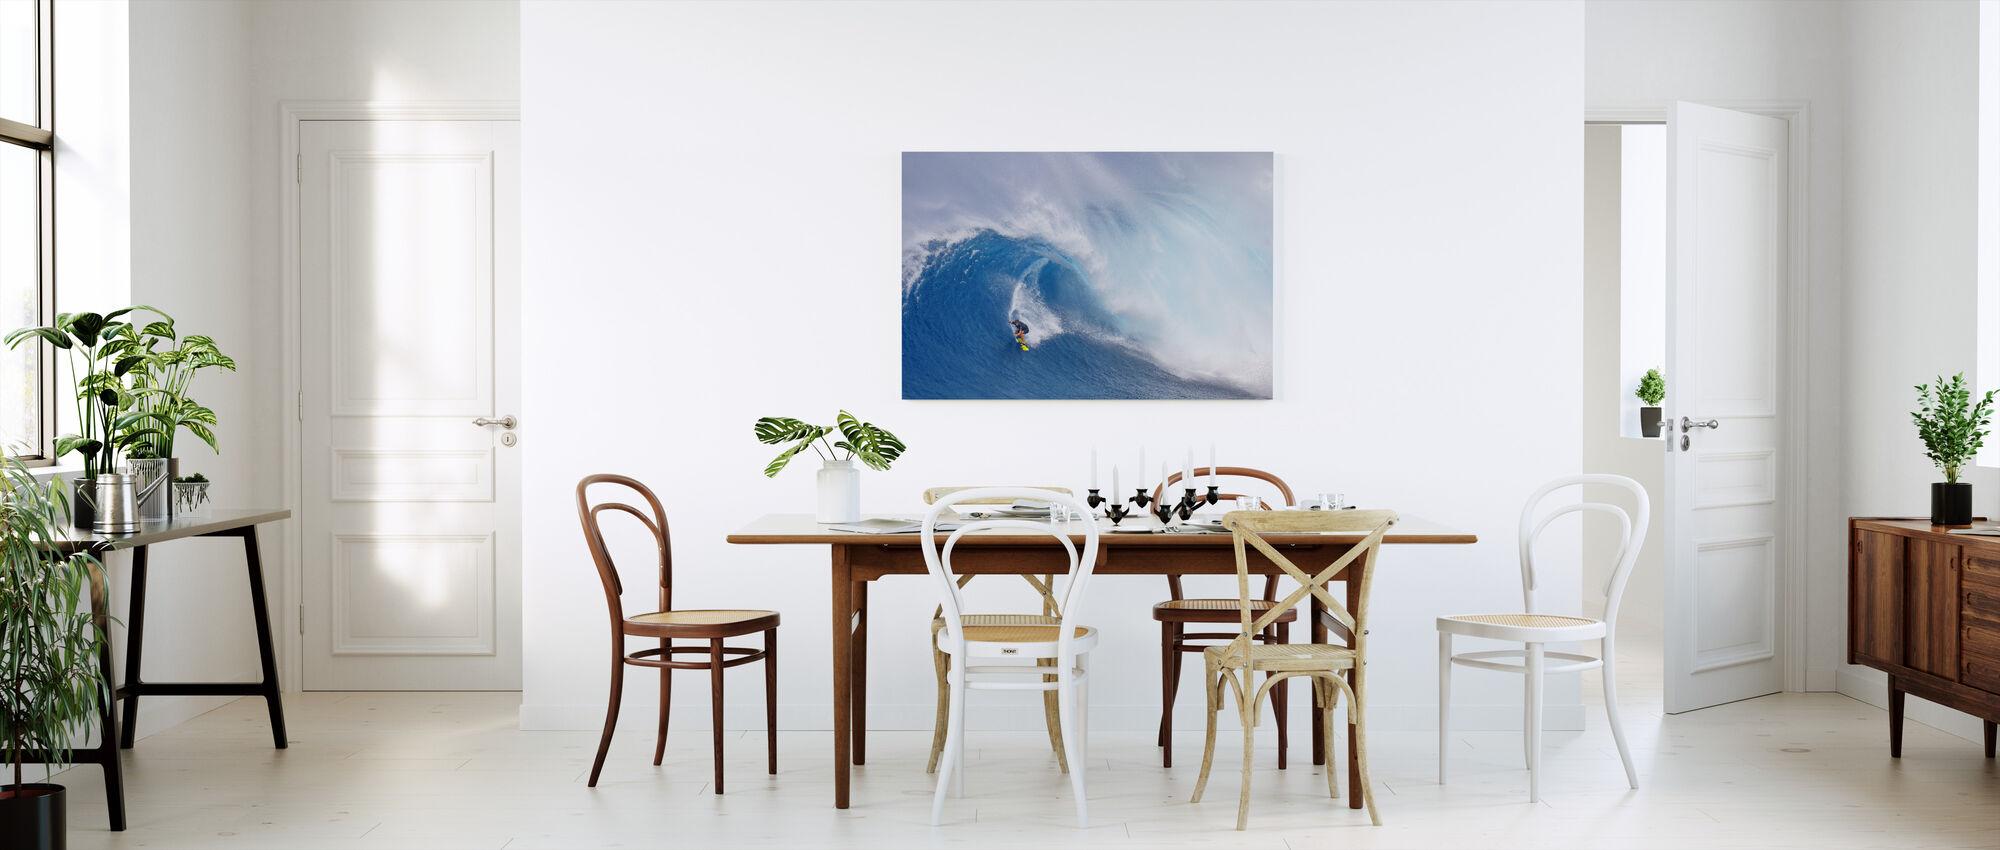 Surfbacken - Leinwandbild - Küchen